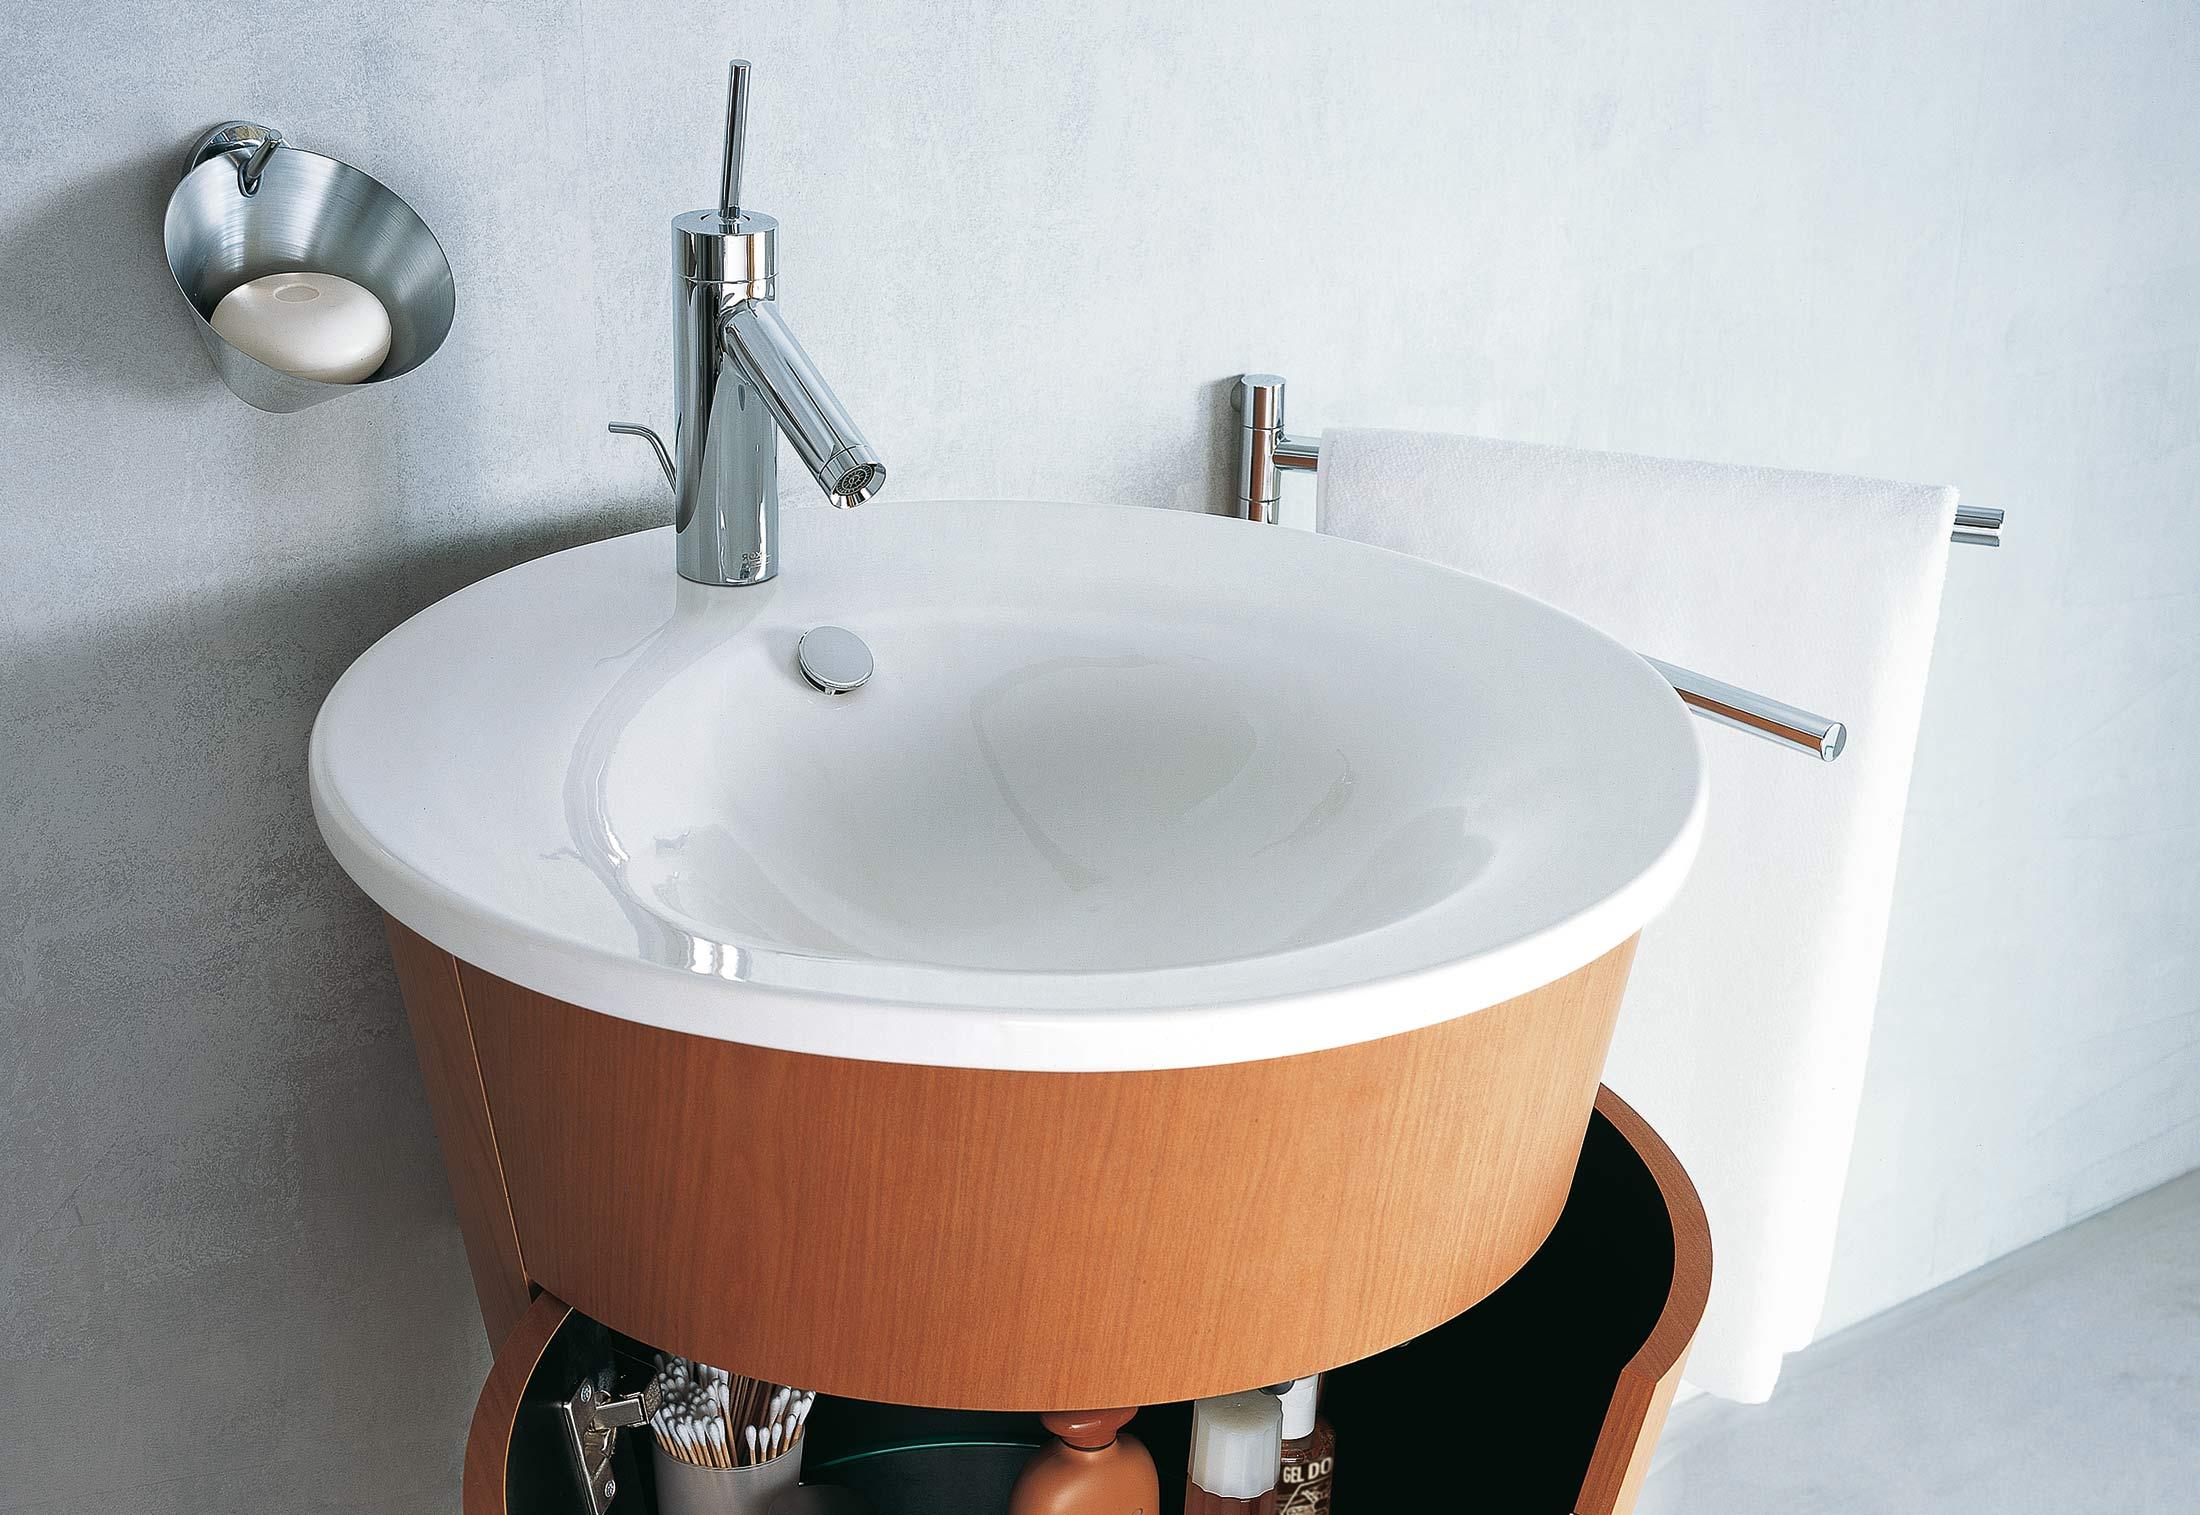 starck 1 console basin by duravit stylepark. Black Bedroom Furniture Sets. Home Design Ideas